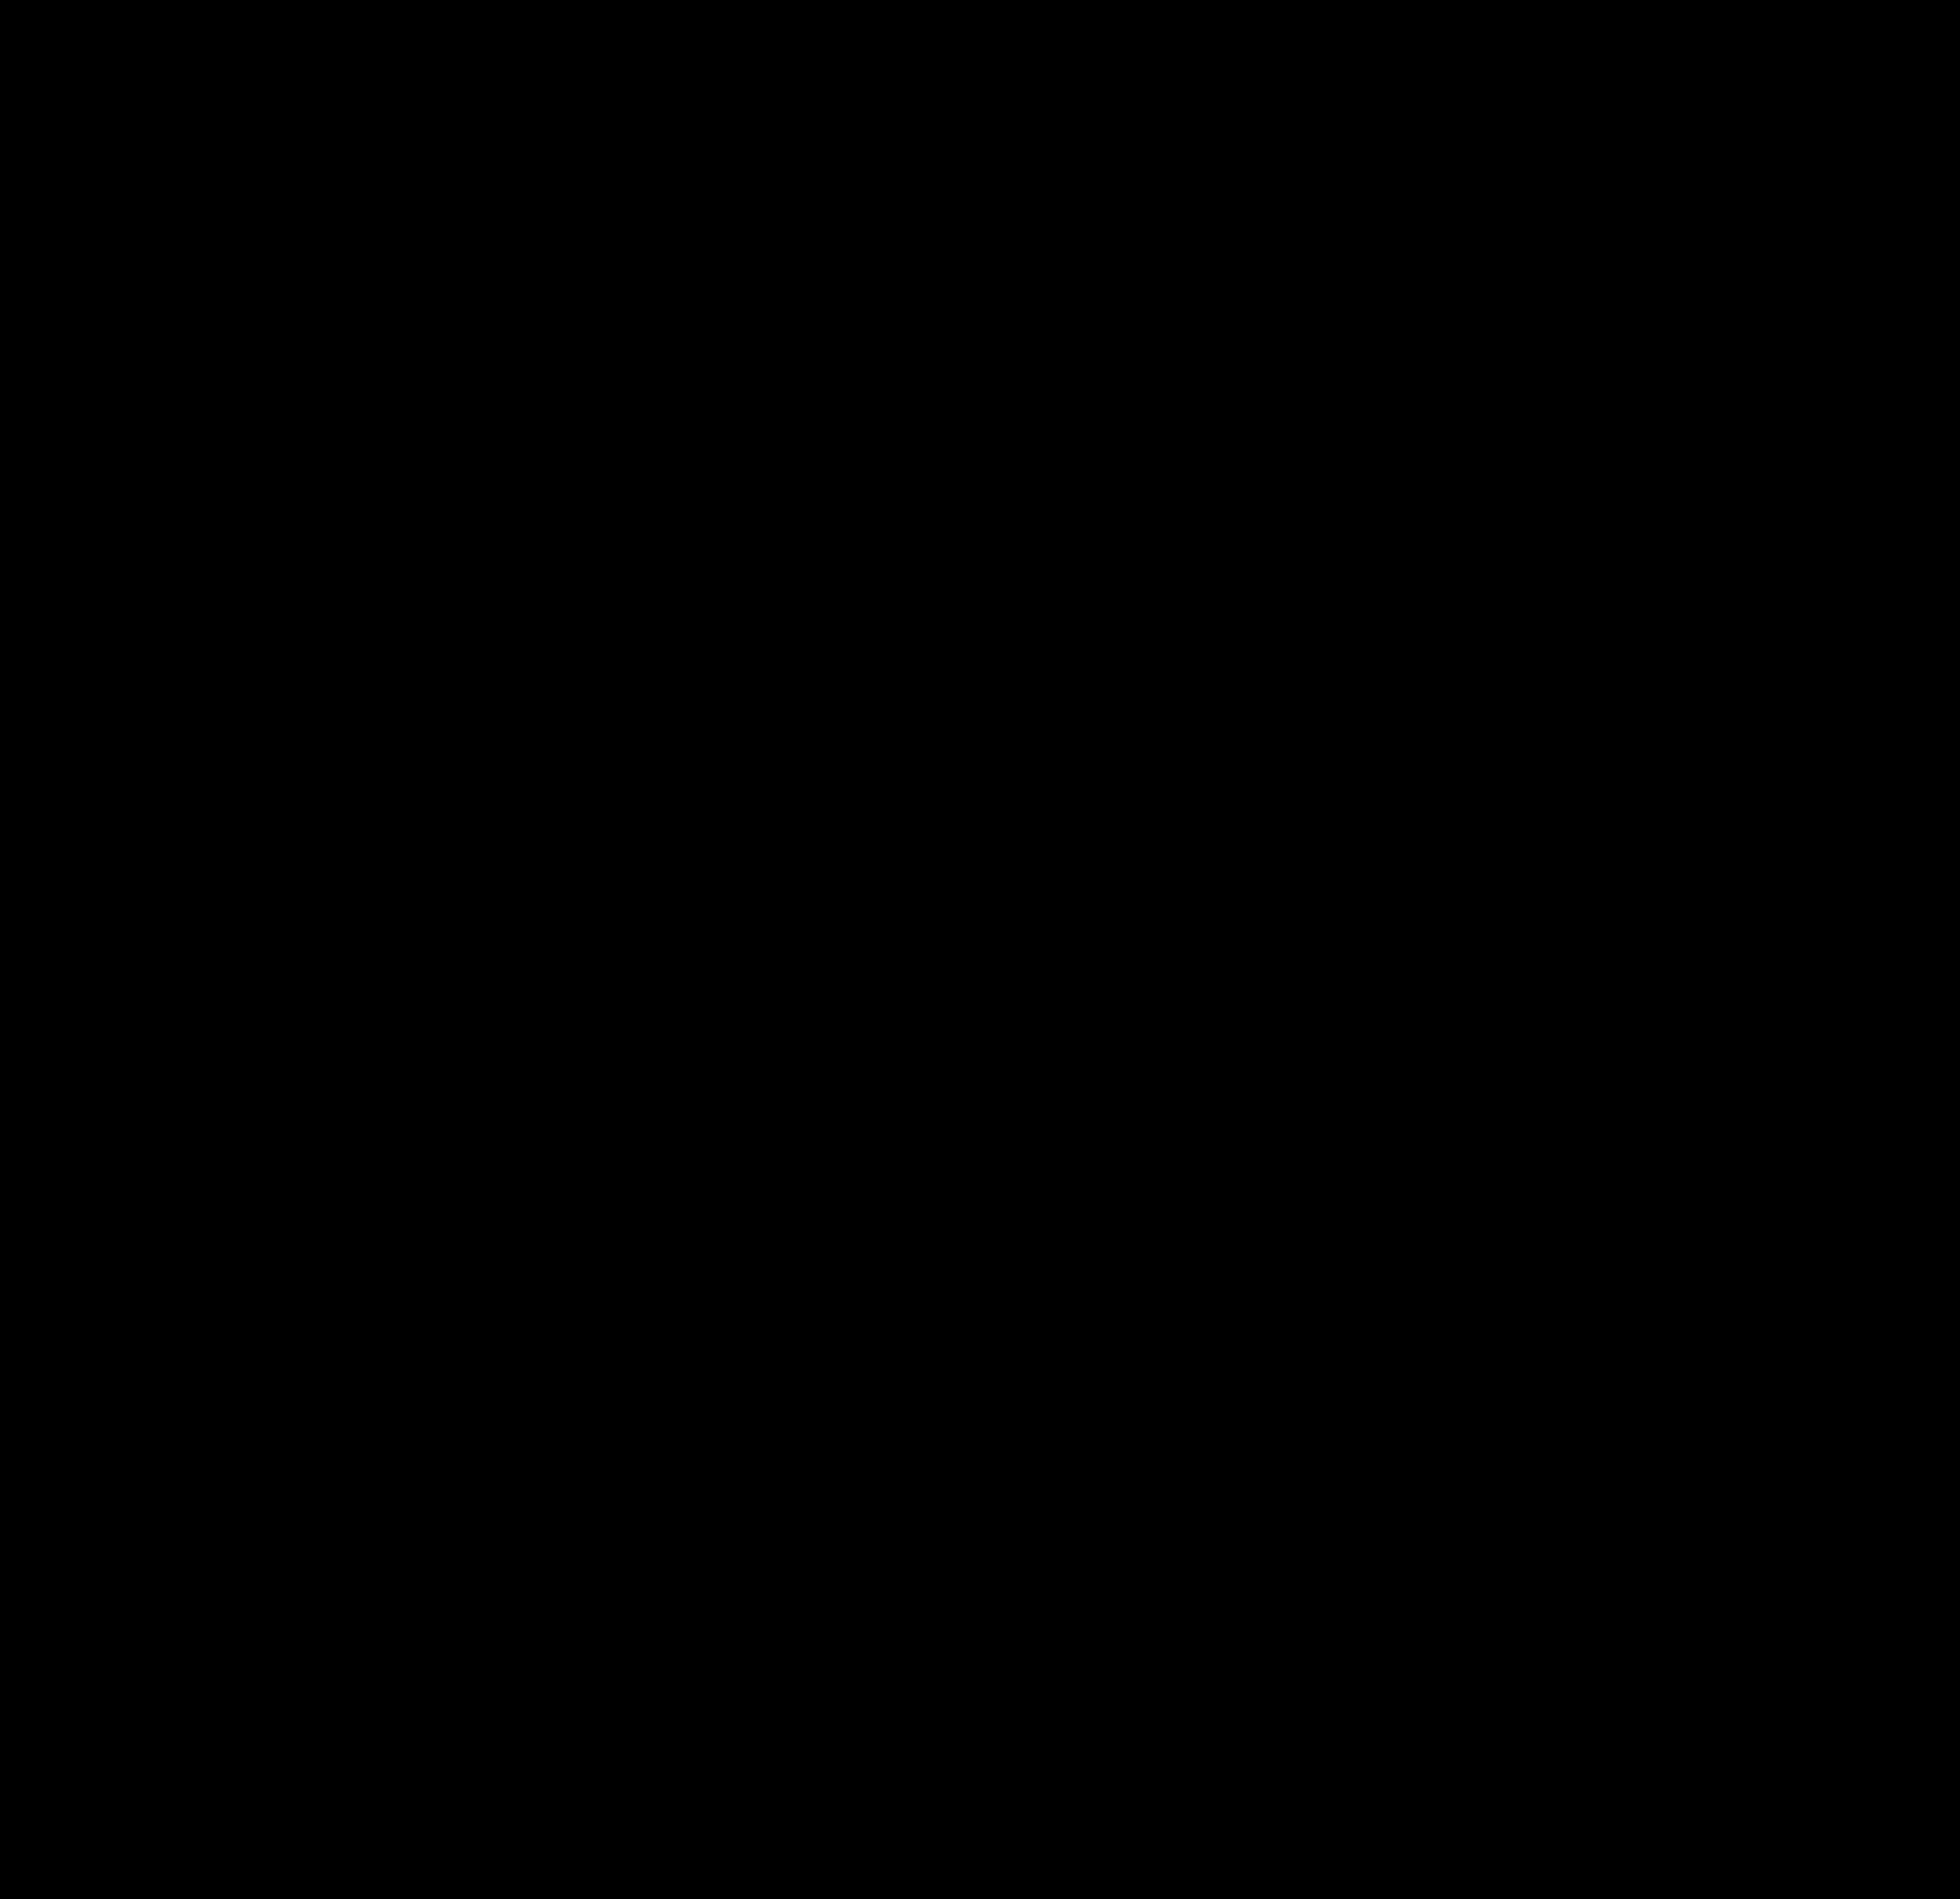 Luminaria-billboard